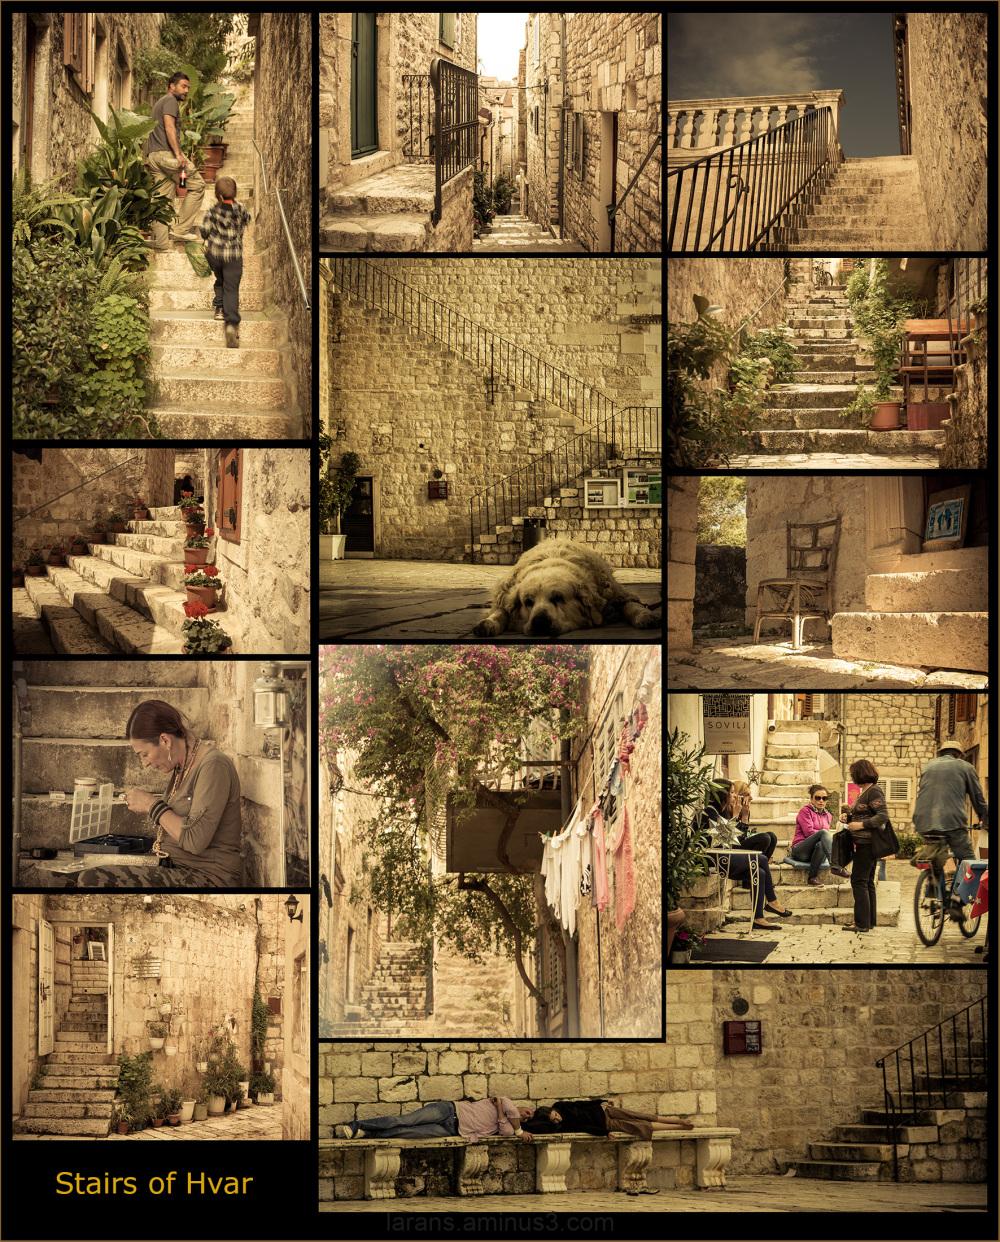 ...stairs of Hvar...